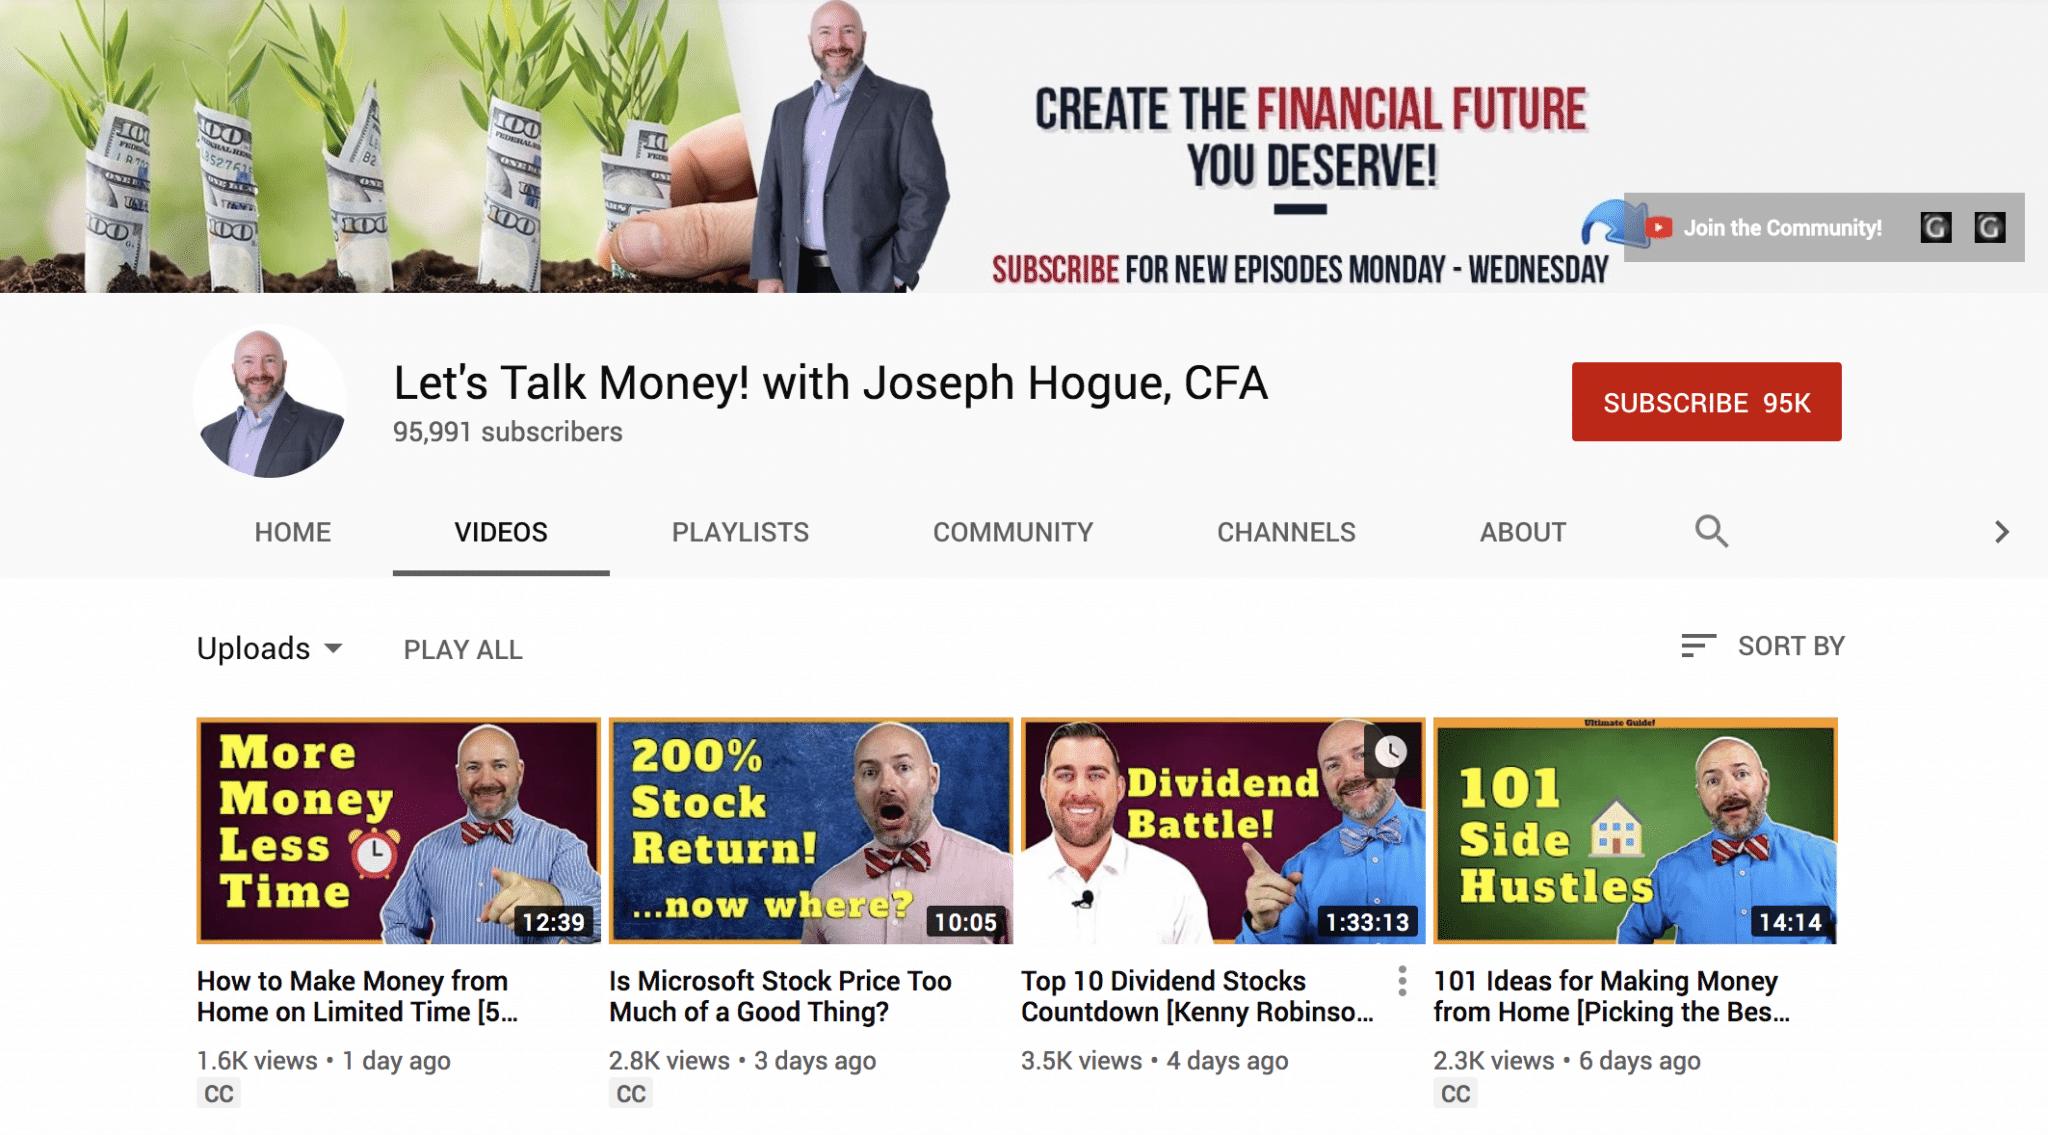 CFA Joseph Hogue's YouTube channel